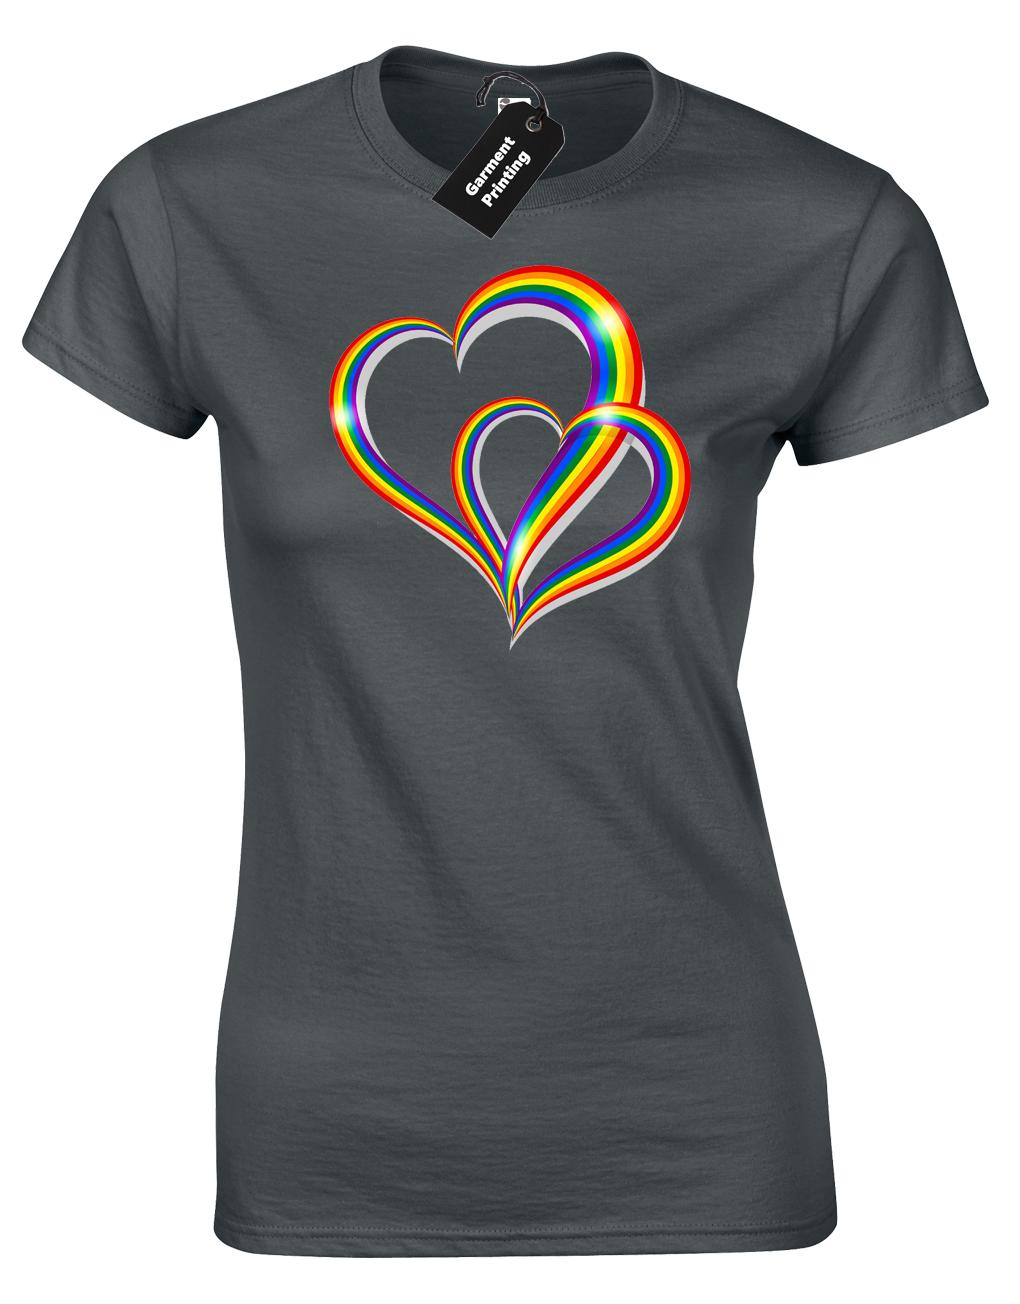 2 Pride Hearts Ladies T-Shirt Gay Lesbian Lgbt Unisex Rainbow Womens Top ( Col) 2